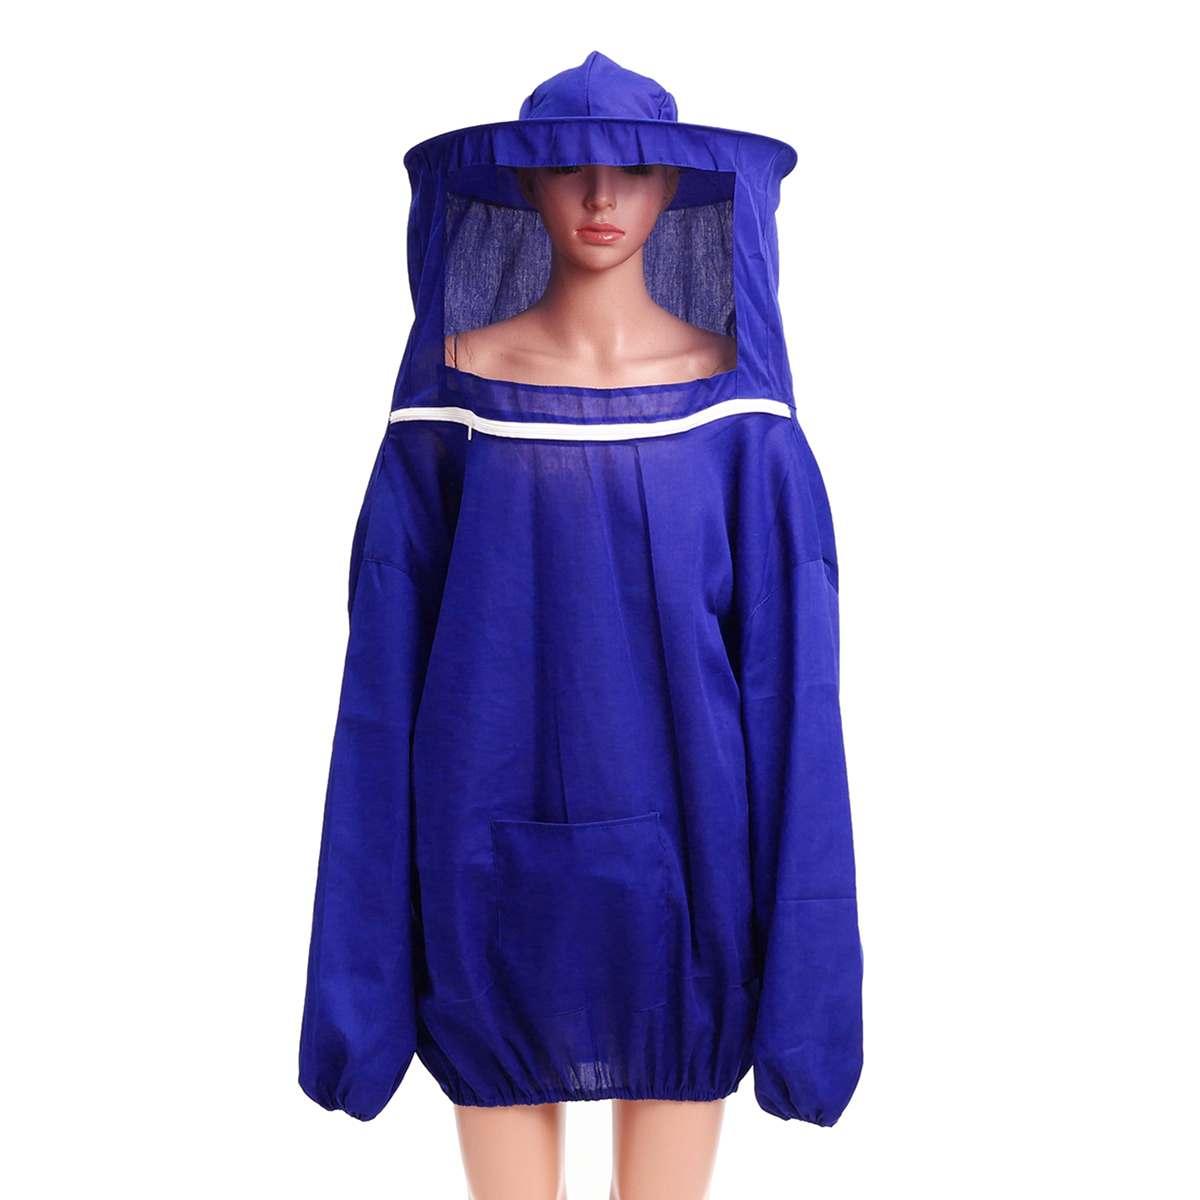 Anti Bee Beekeeper Suit Unisex Beekeeping Protective Clothing Costume Jacket Coat Defens Extensible With Hood Home Supplies